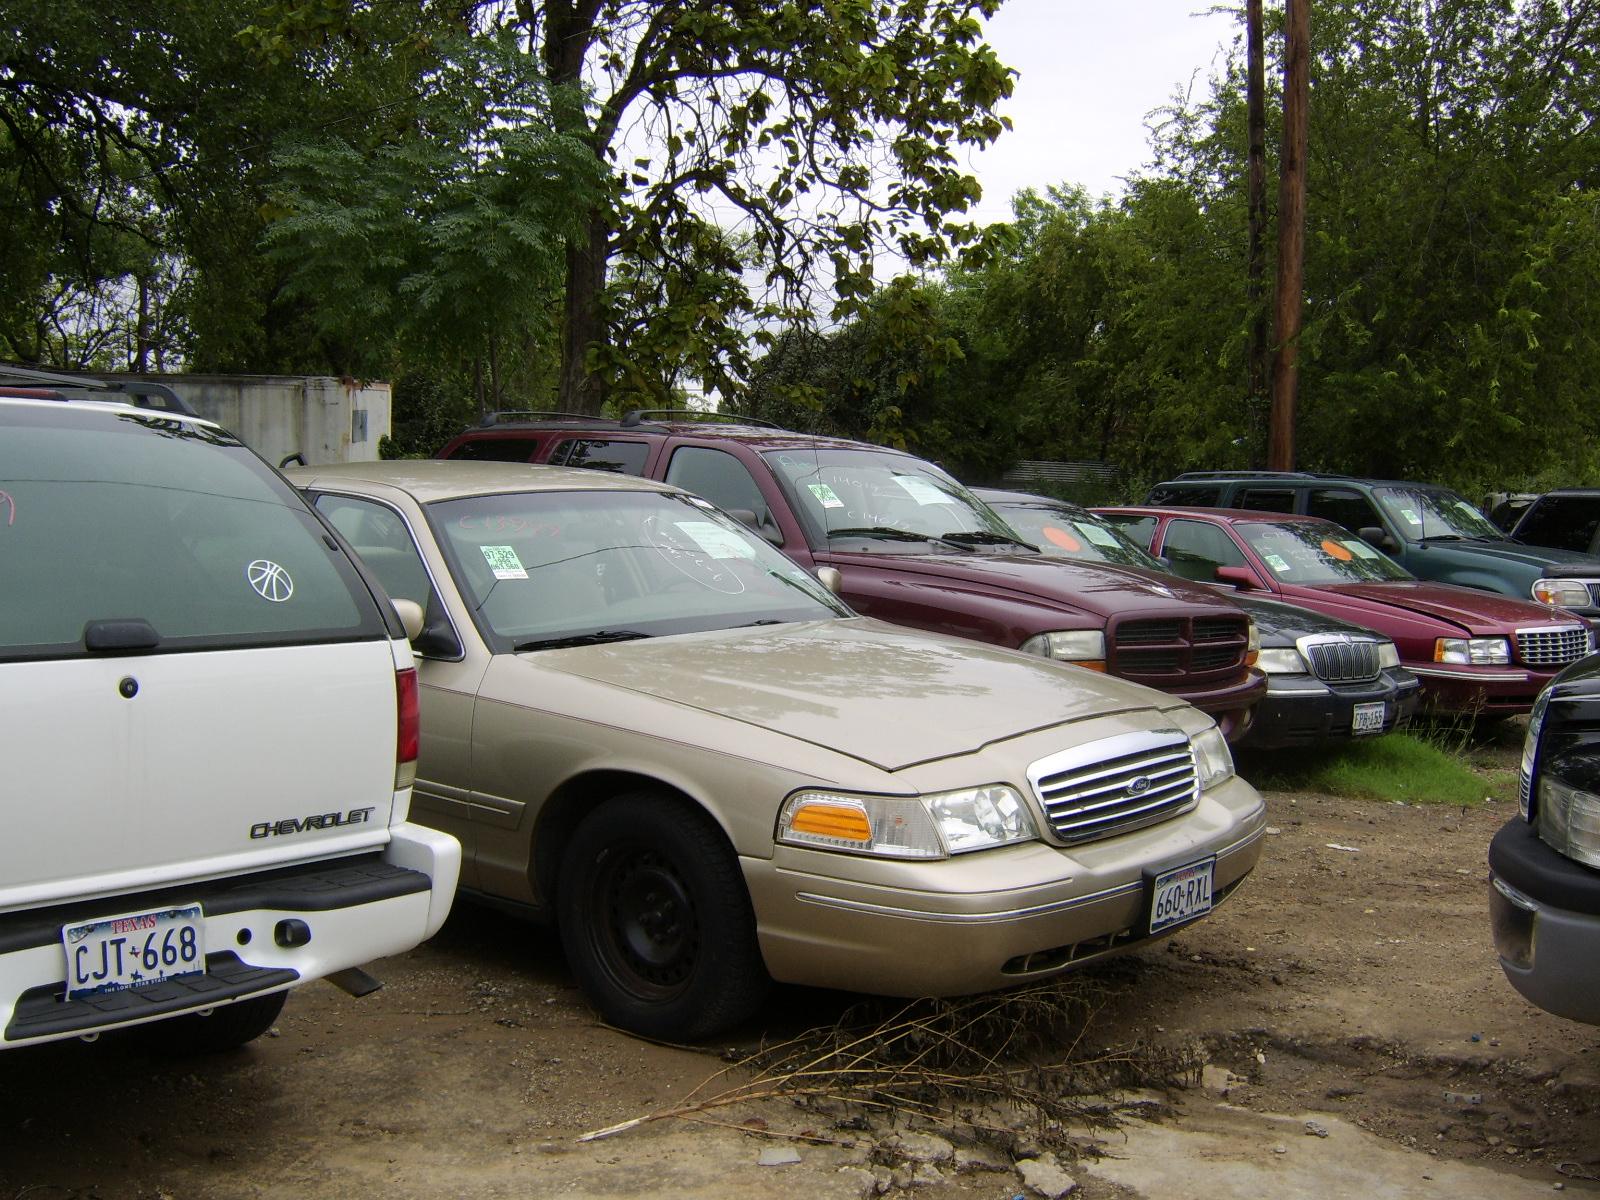 Autonation Ford Fort Worth >> A Plus Auto Salvage, Fort Worth Texas (TX) - LocalDatabase.com